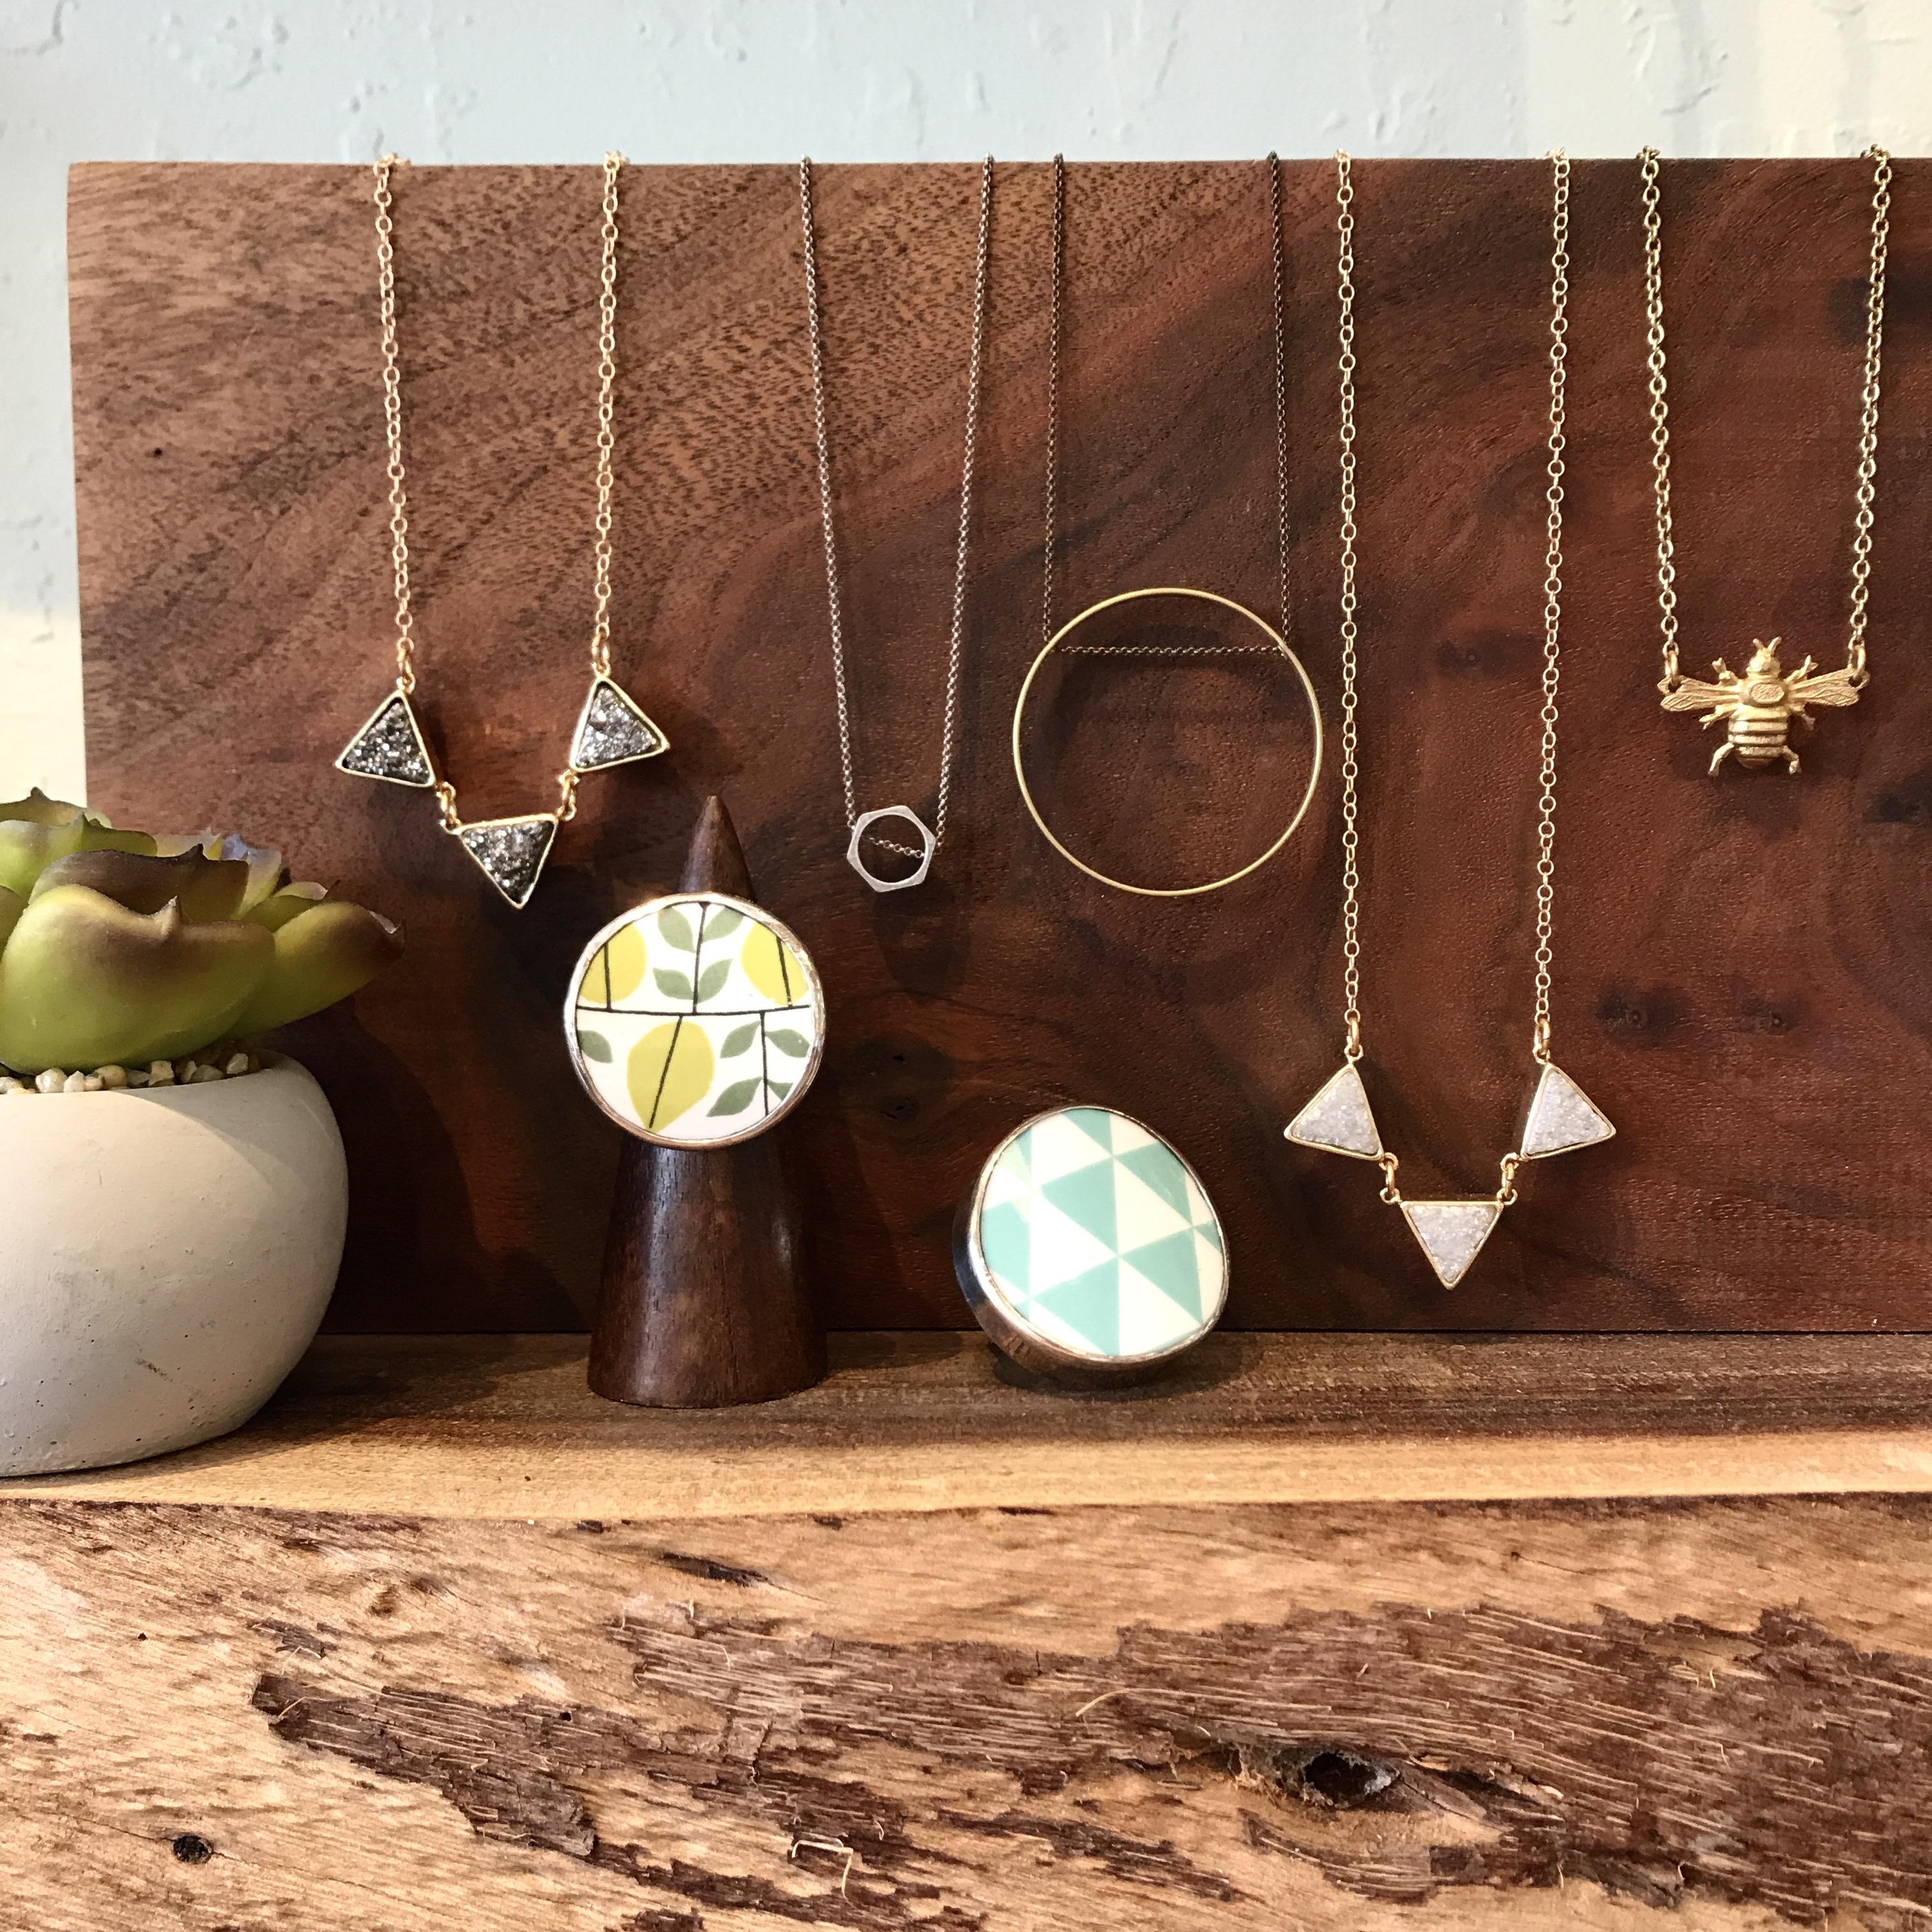 handmade jewelry by Larissa Loden